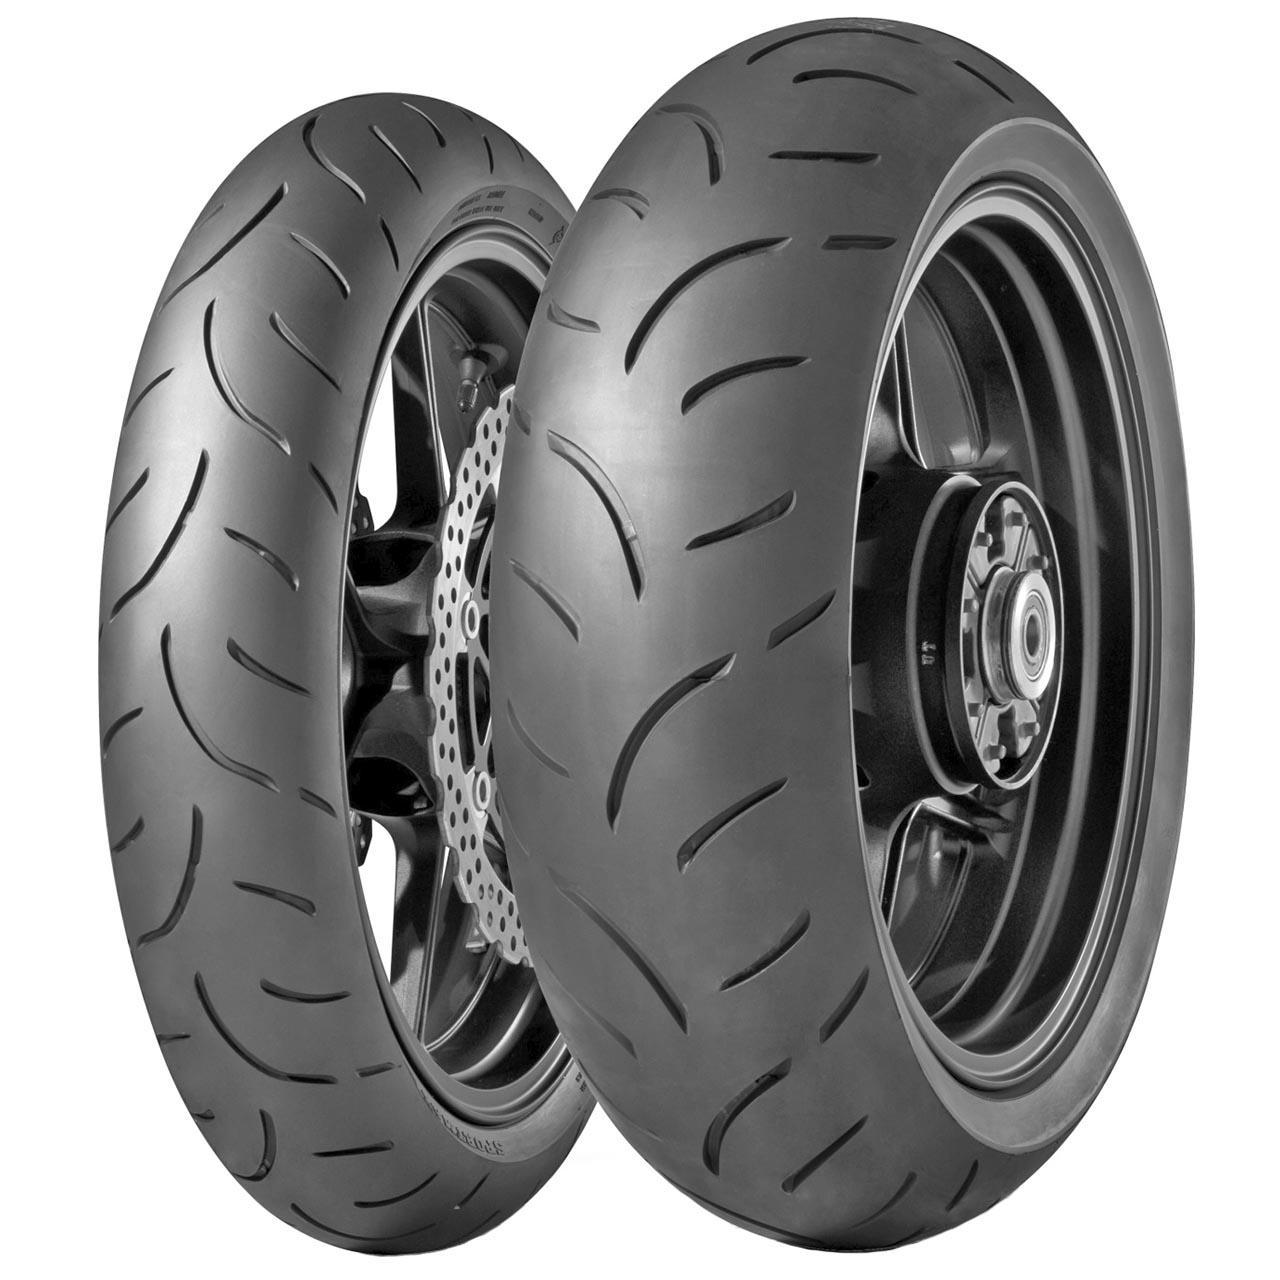 Dunlop Sportmax Qualifier 2 180/55ZR17 (73W) TL